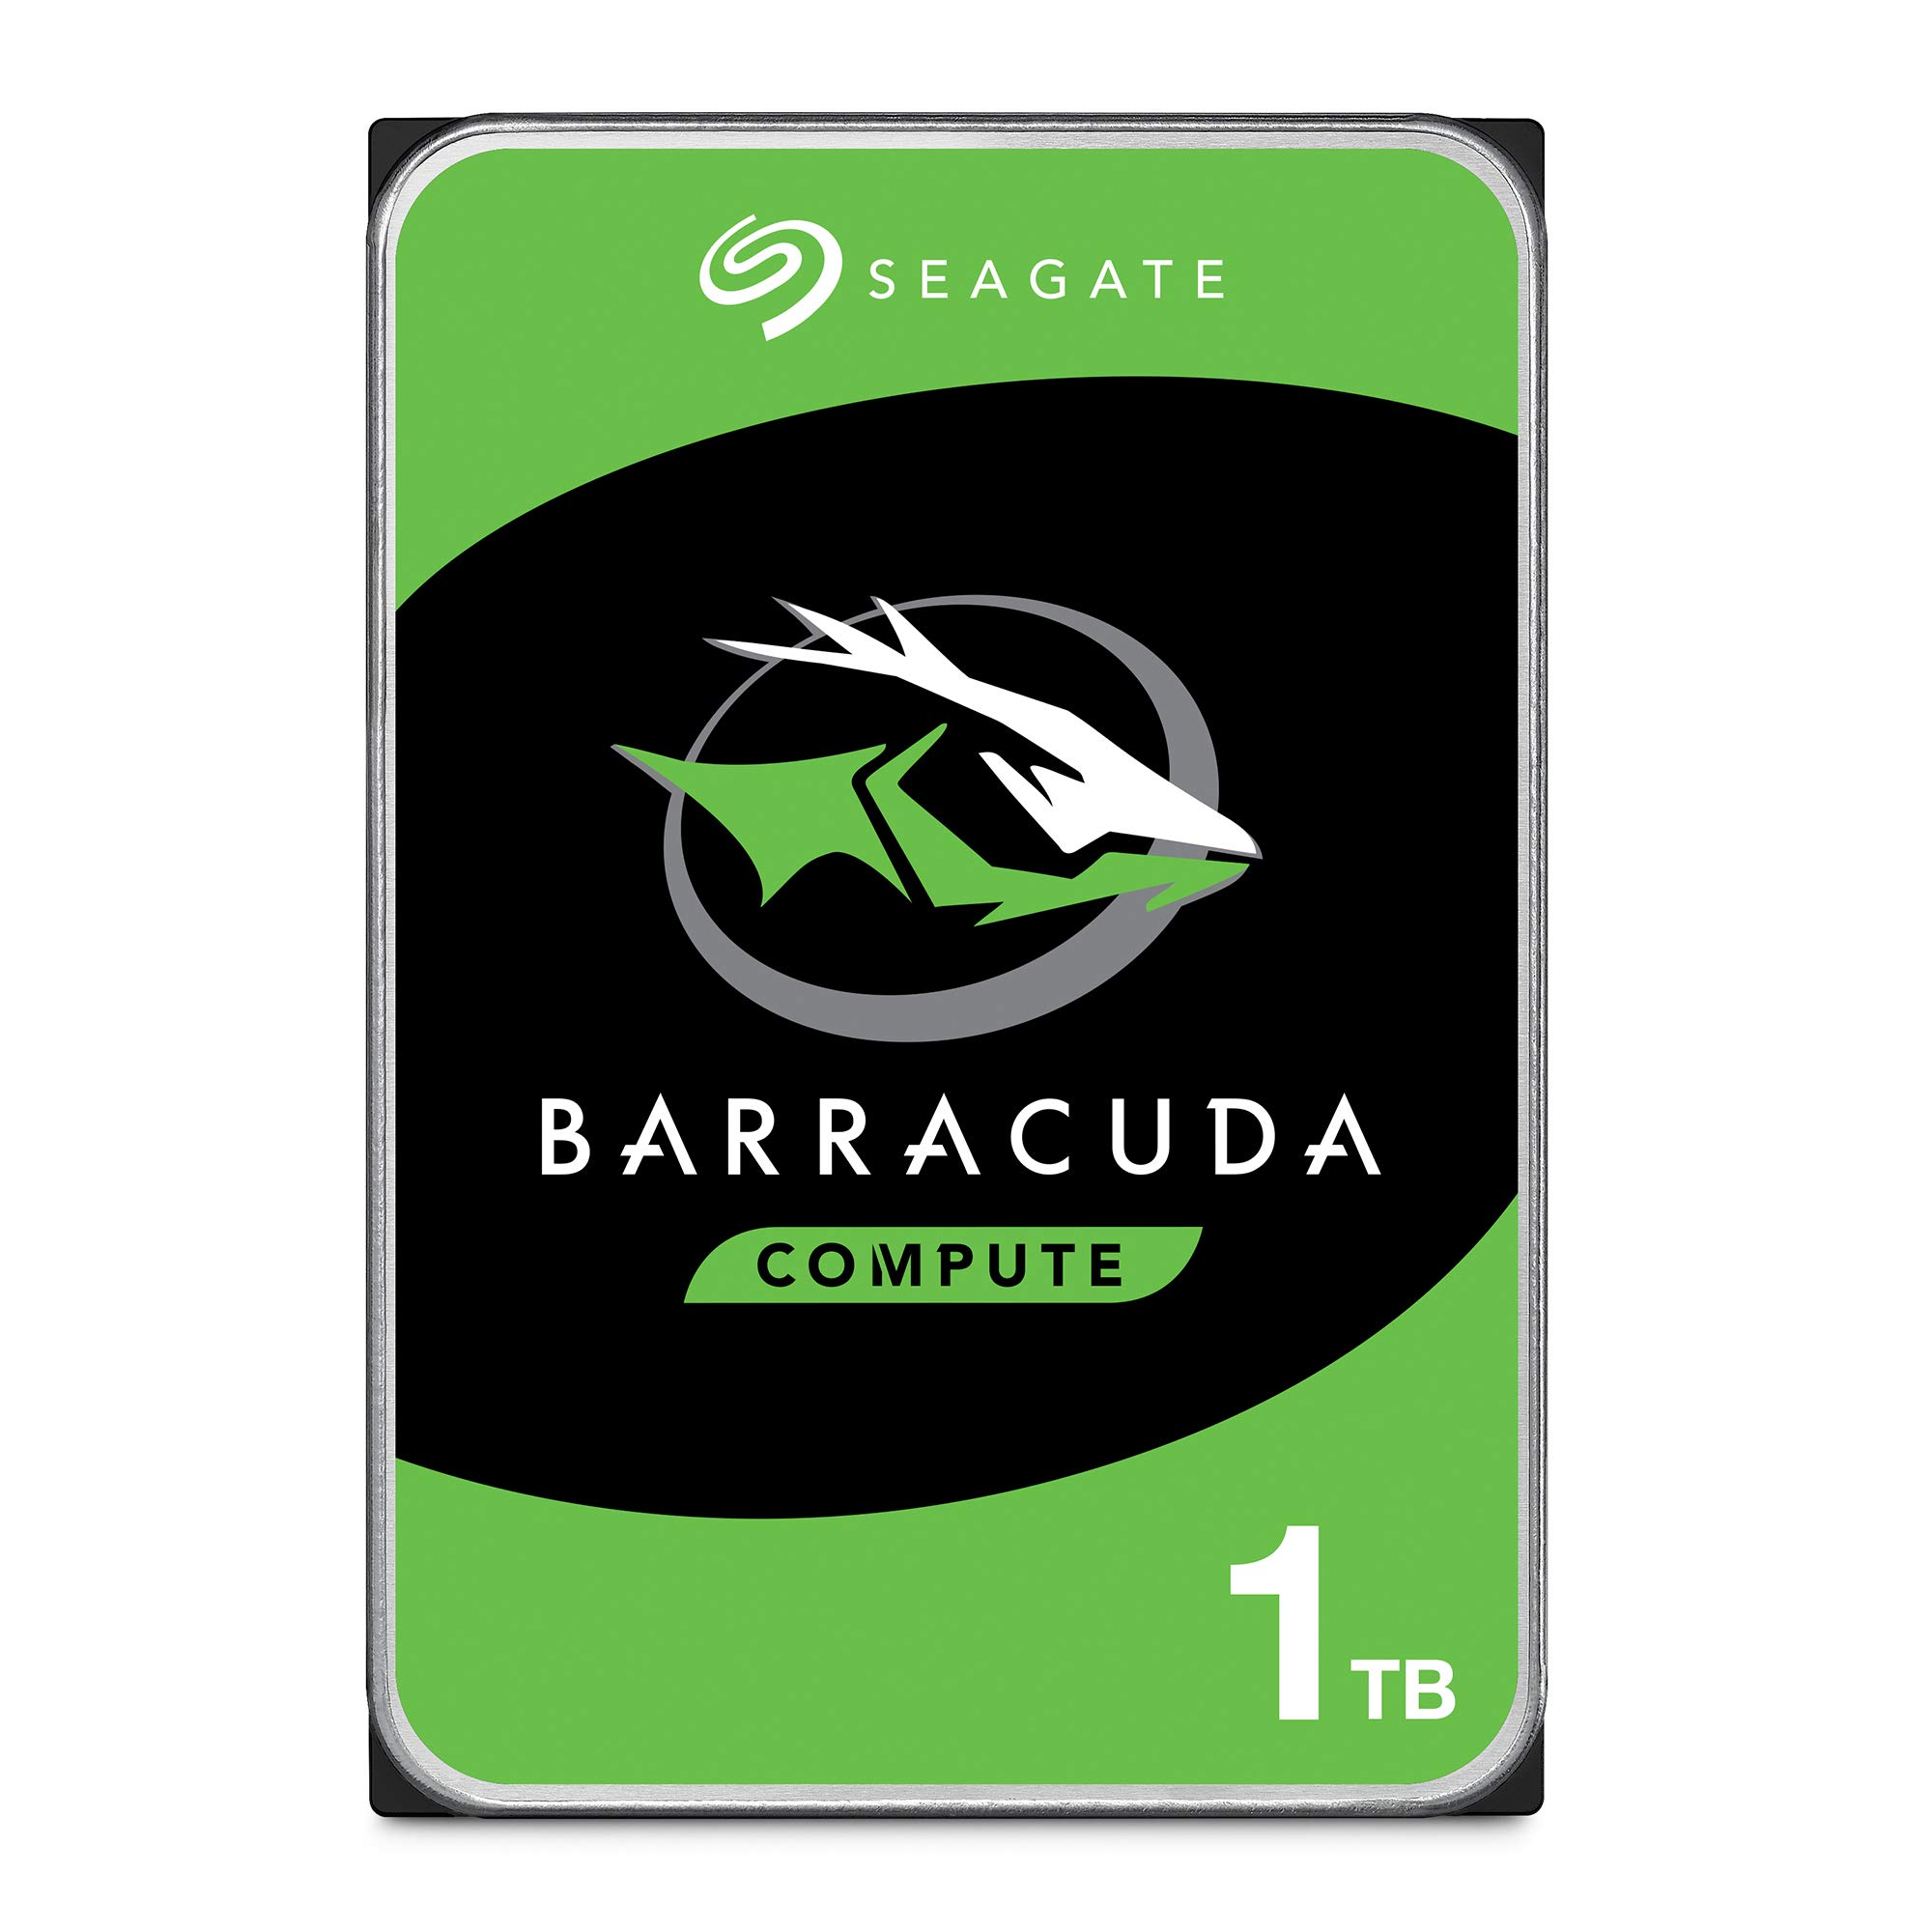 HDD 1TB SATA Seagate BarraCuda 1TB 3.5in 6 Gb/s 7200 RPM 64M